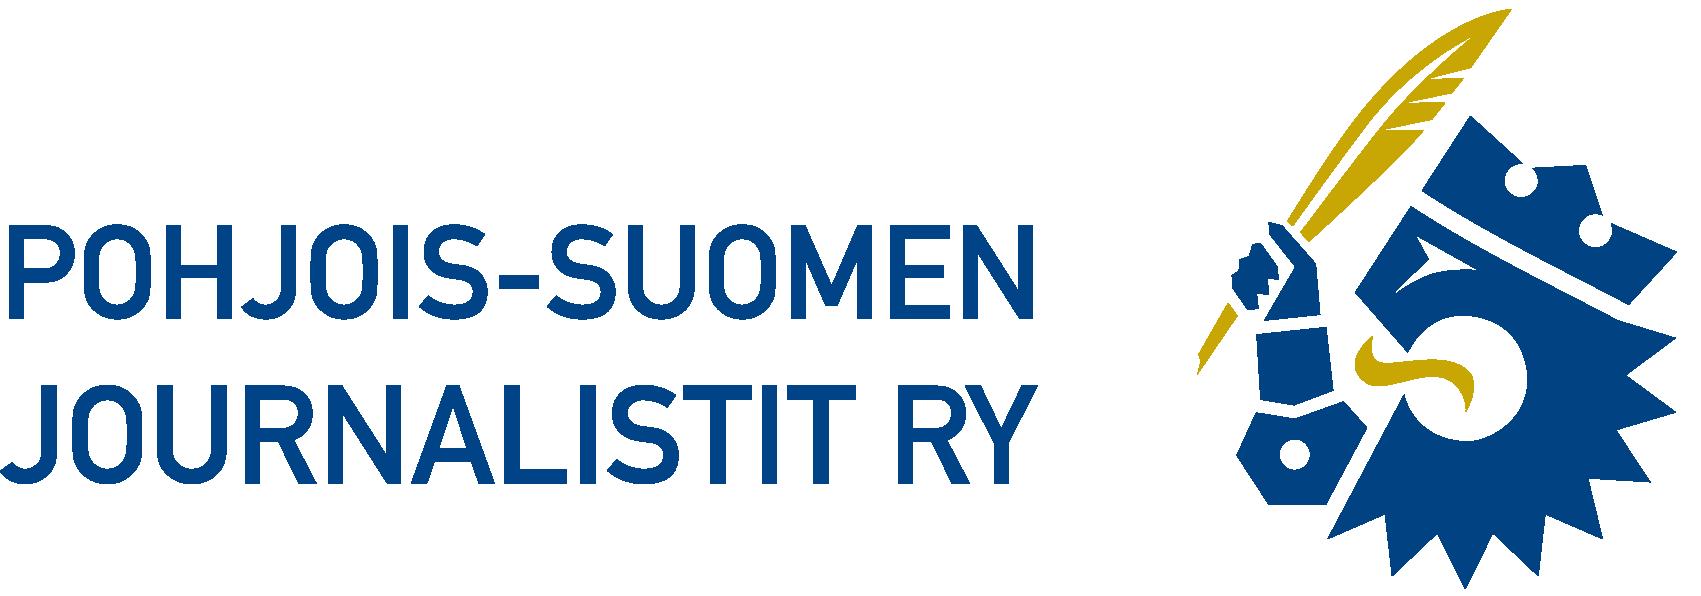 Pohjois-Suomen Journalistit ry